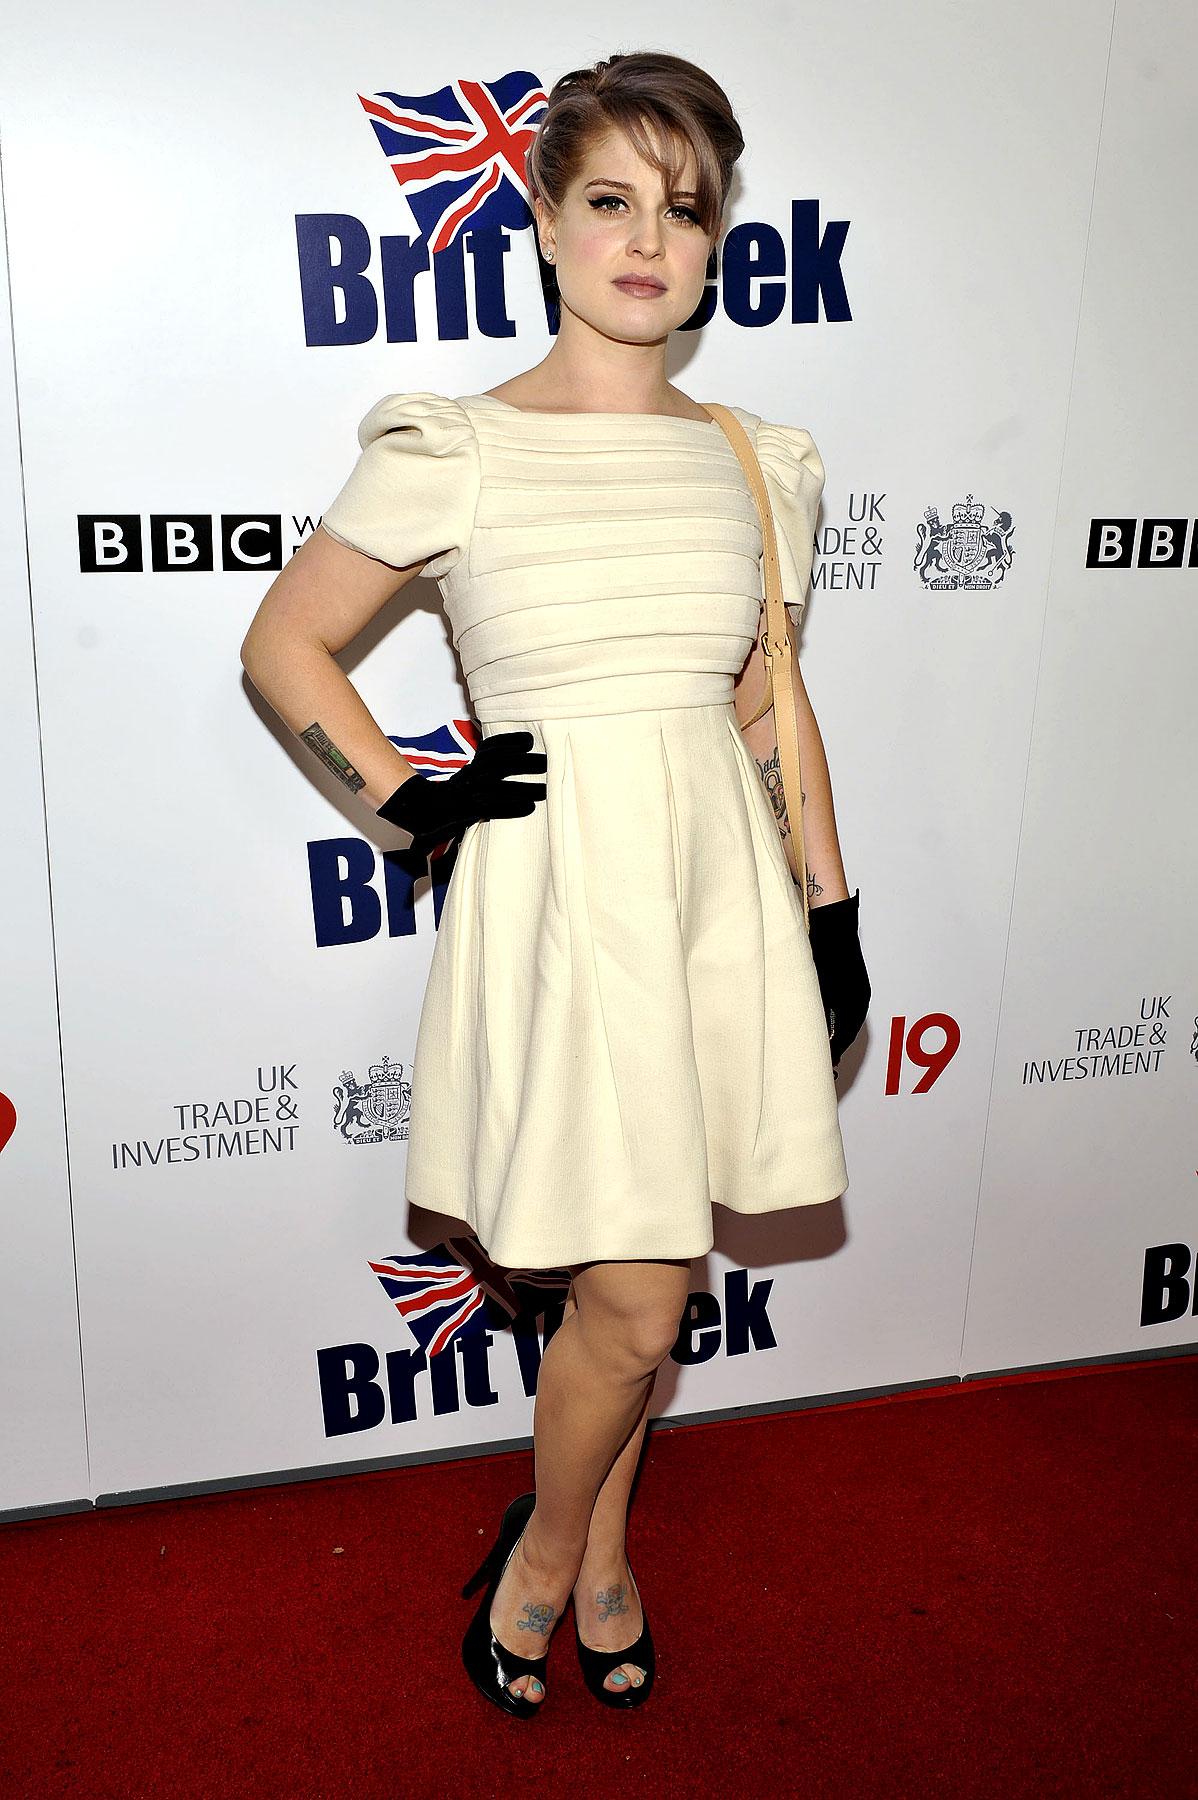 Fashion FTW: Kelly Osbourne Looks Prim & Proper On The Red Carpet (PHOTOS)